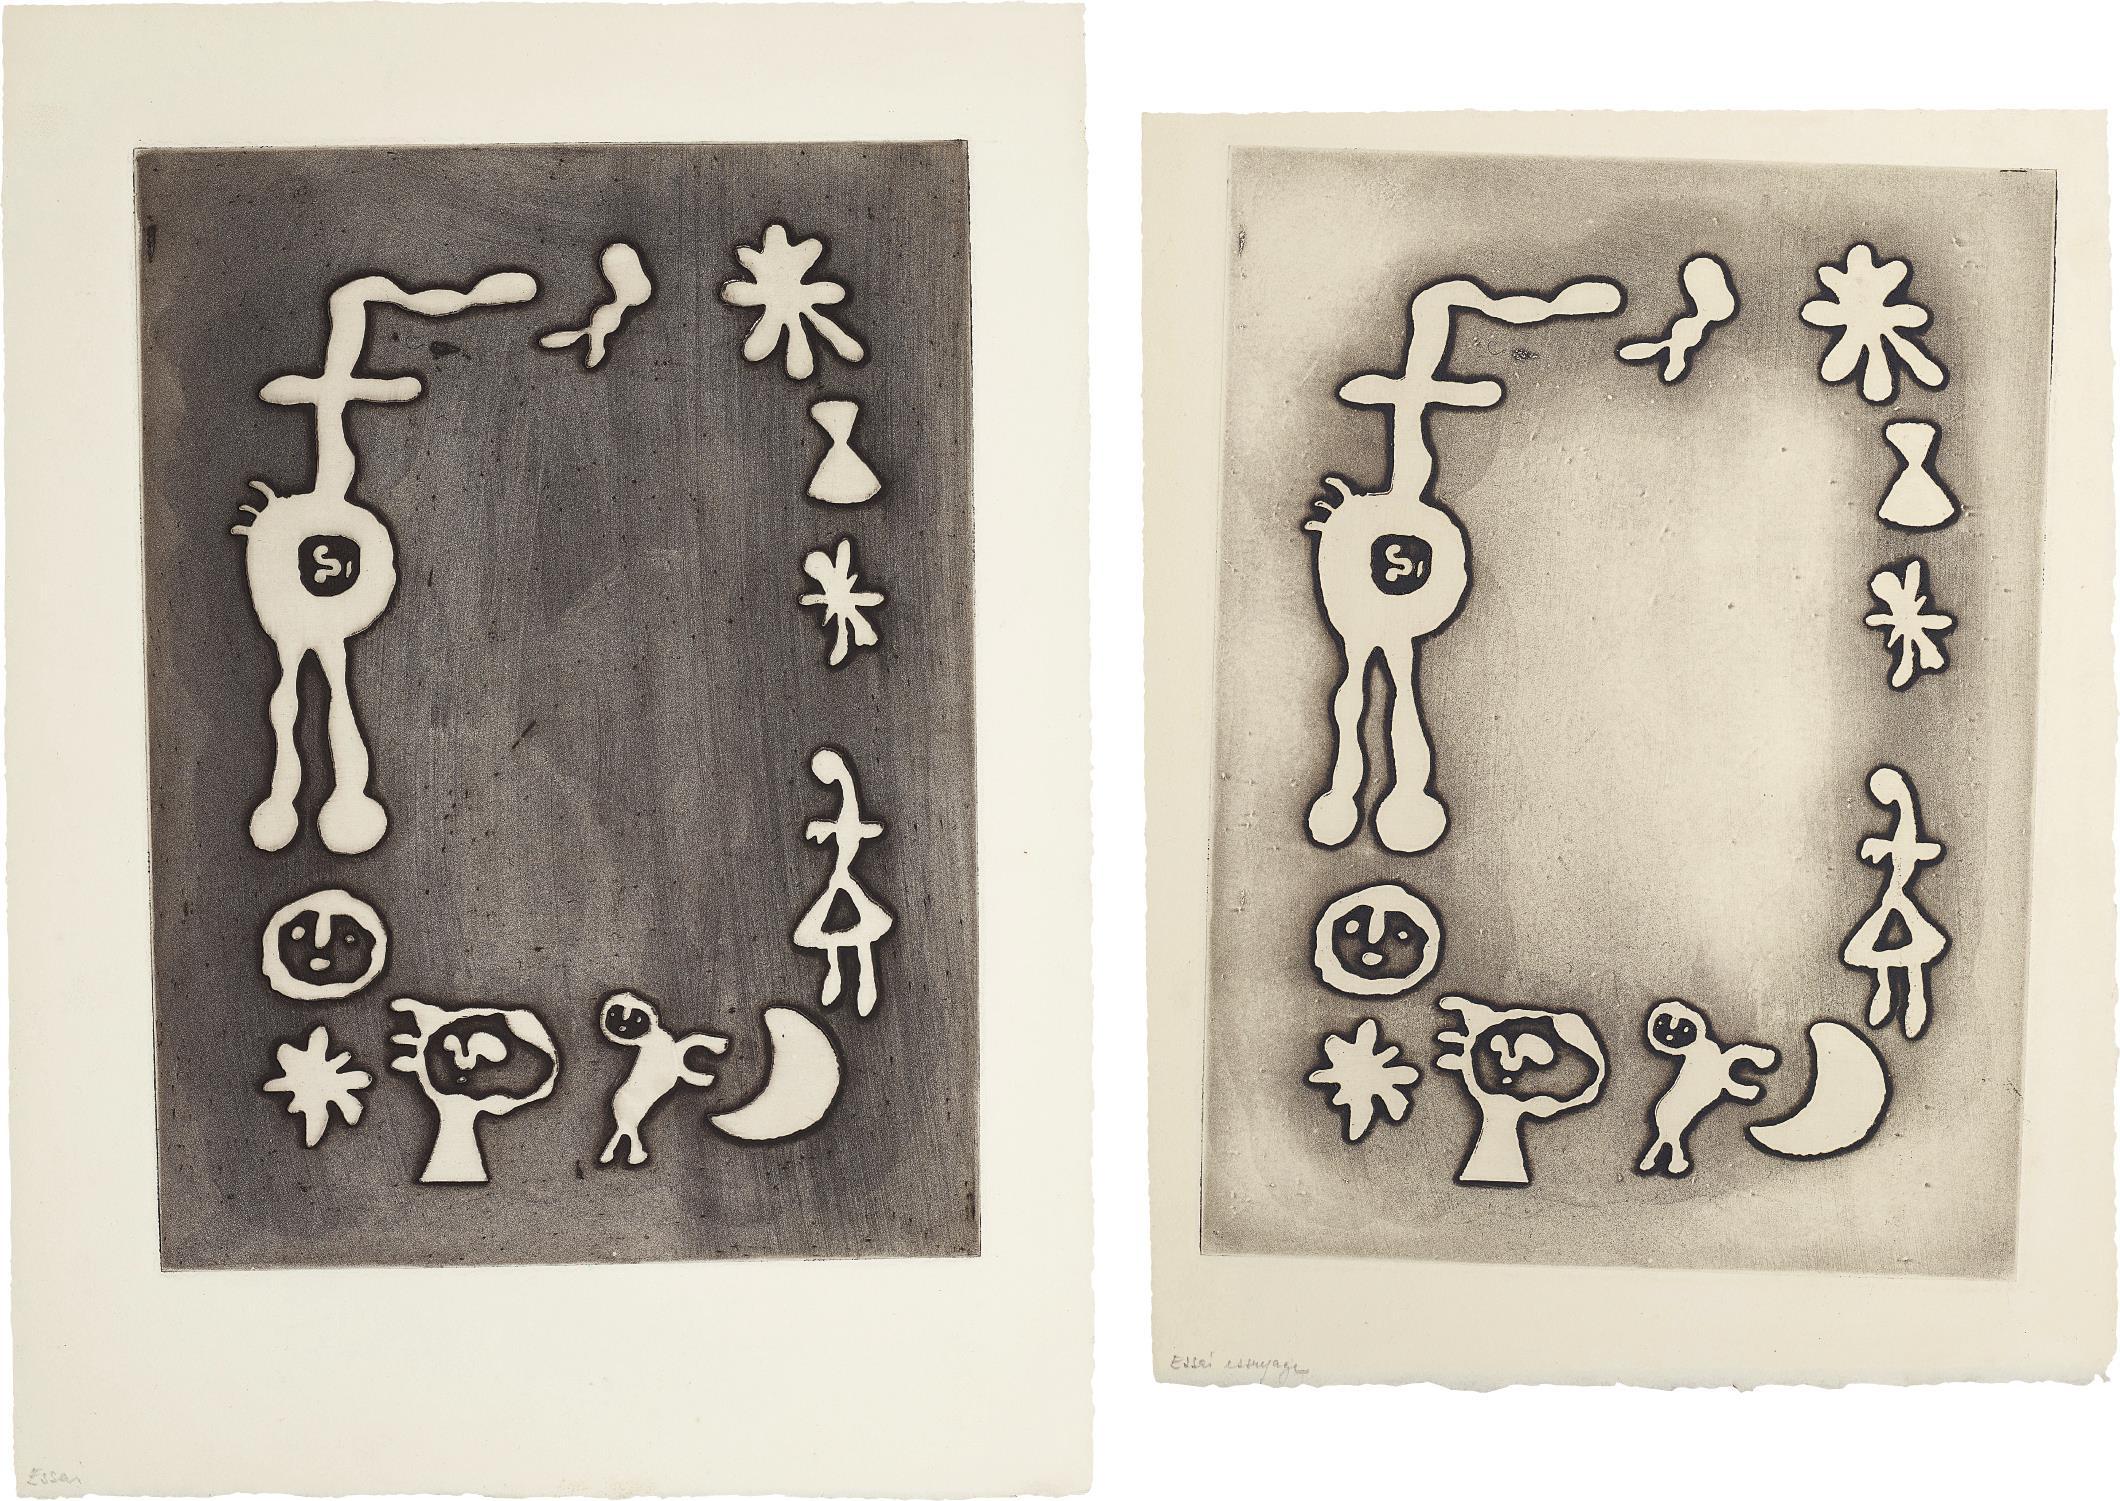 Joan Miro-Ruthven Todd Album, Joan Miro Poem: Two Impressions-1947